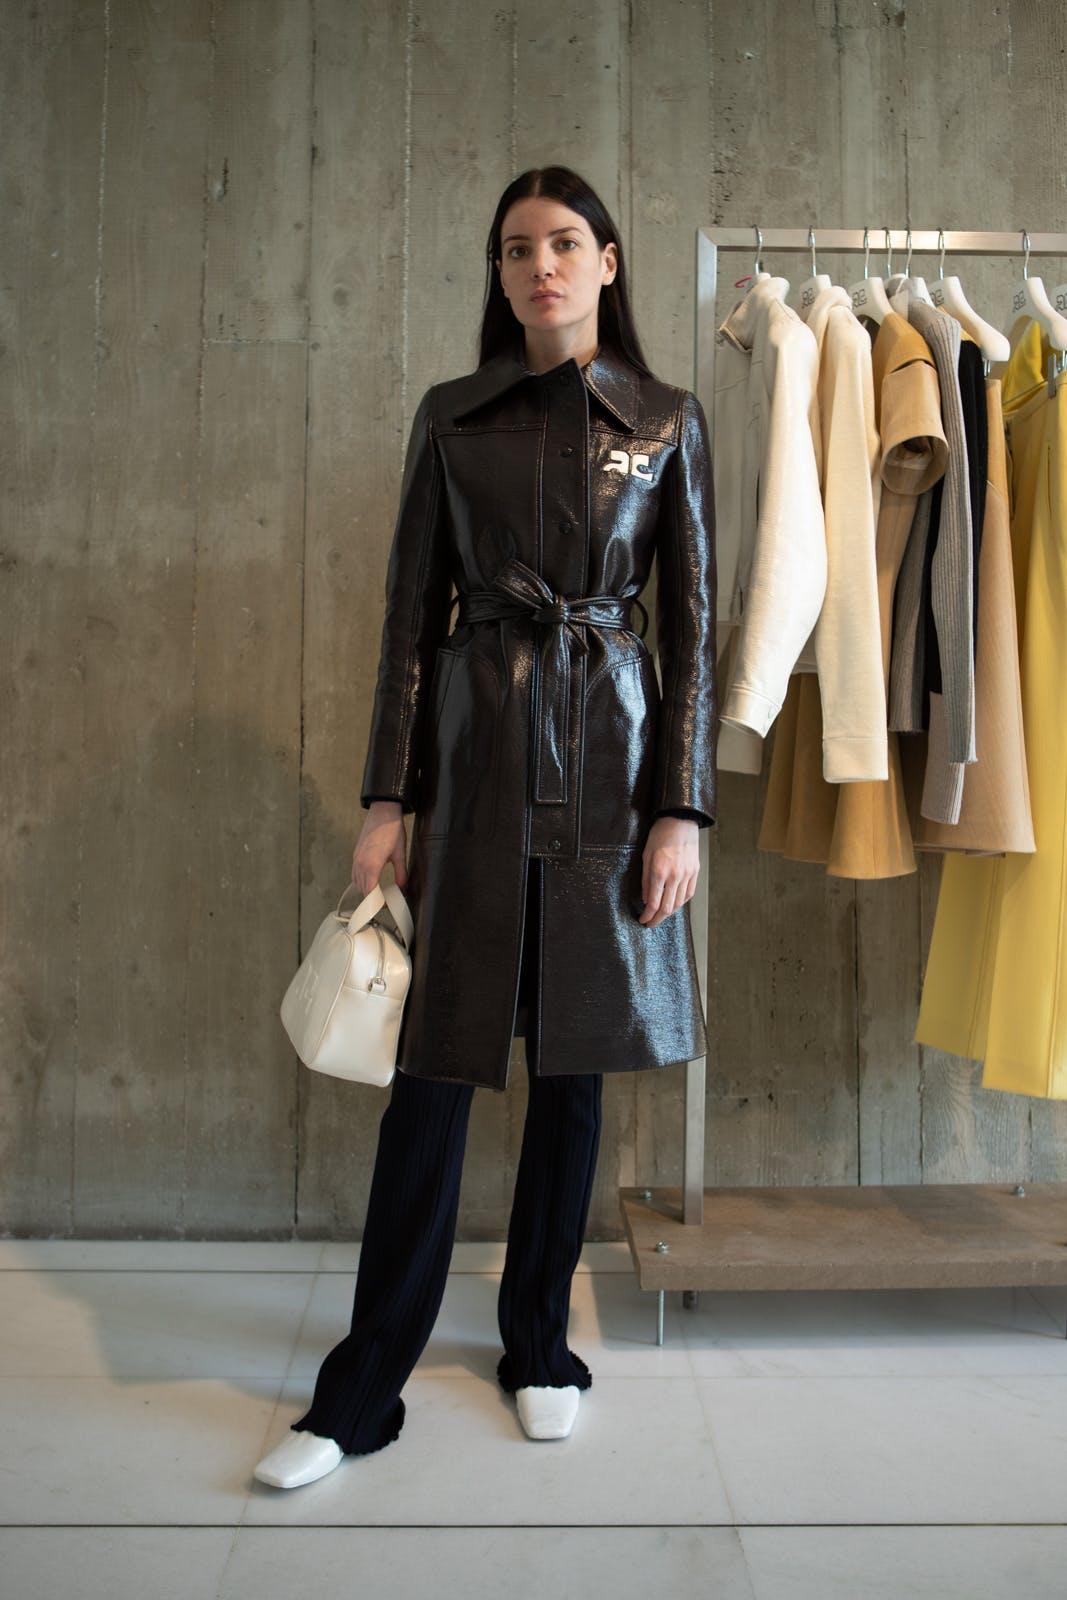 courreges fall winter 2020 runway show backstage womenswear showroom pre order trunk show paris coat